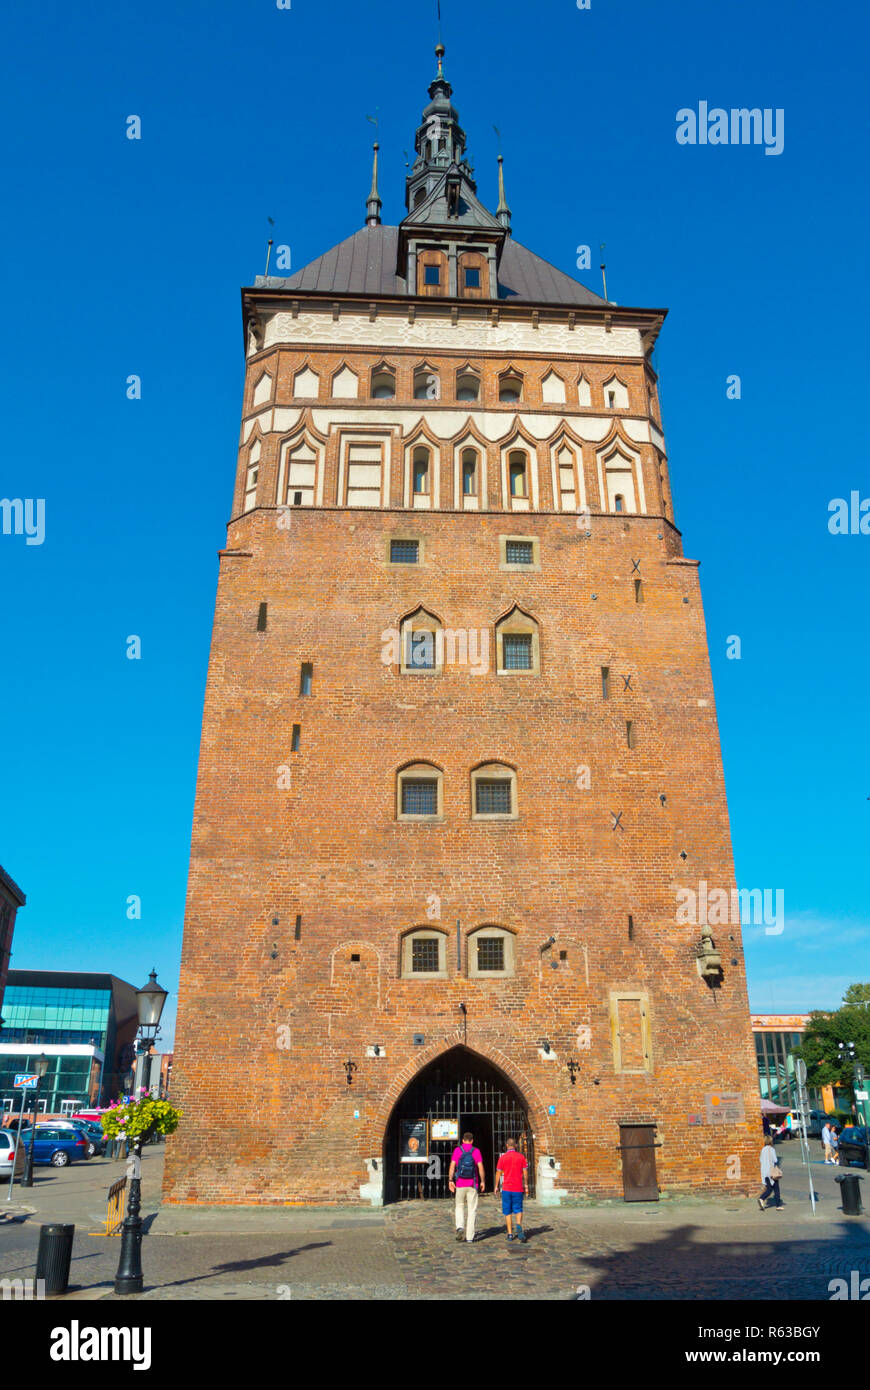 Fore Gate, Targ Weglowy, houses Muzeum Bursztynu, the Amber Museum, Gdansk, Poland - Stock Image